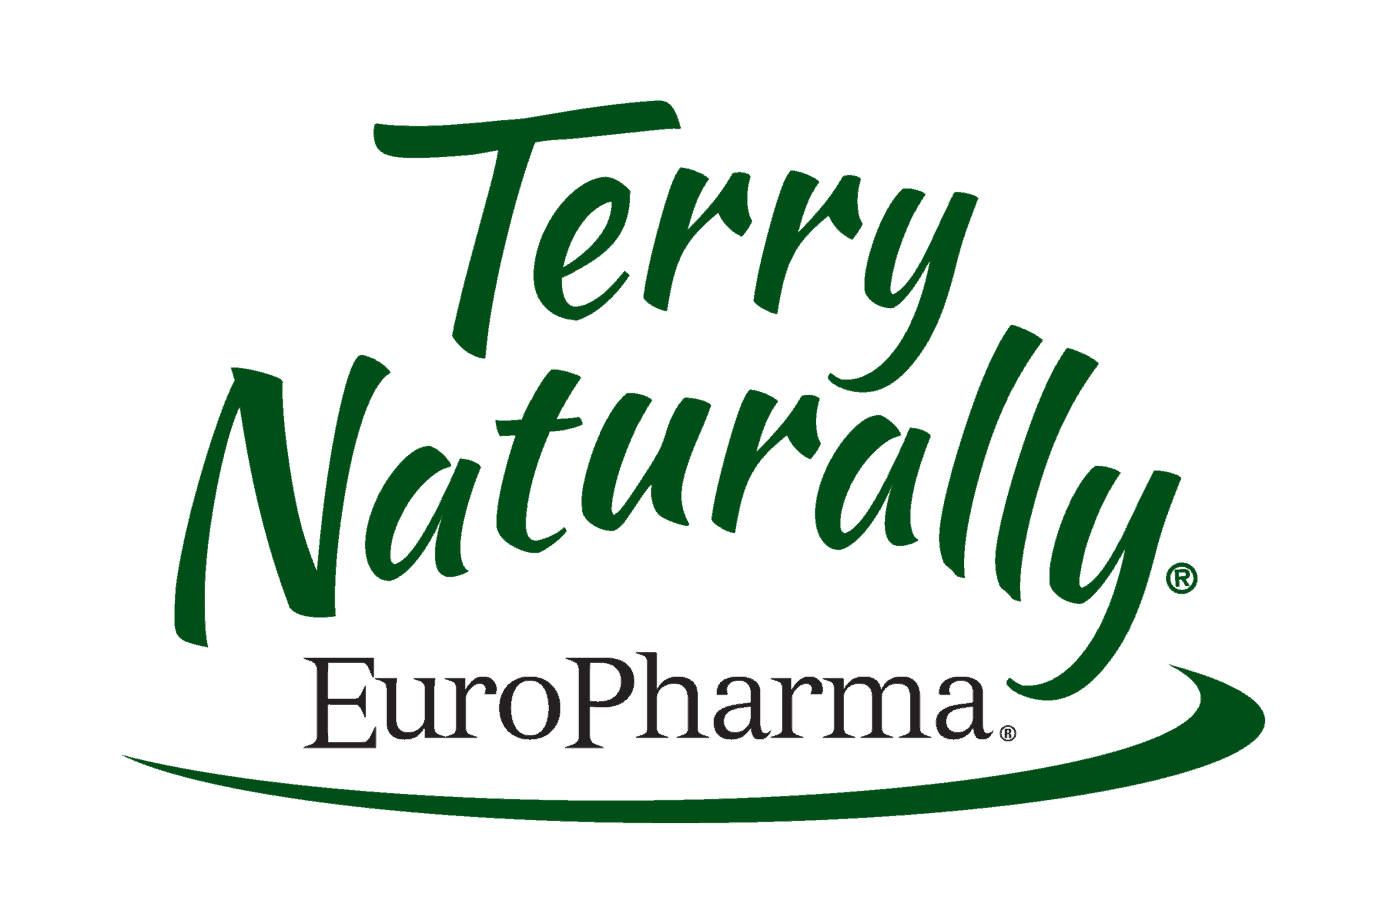 logo-terry-naturally-europharma